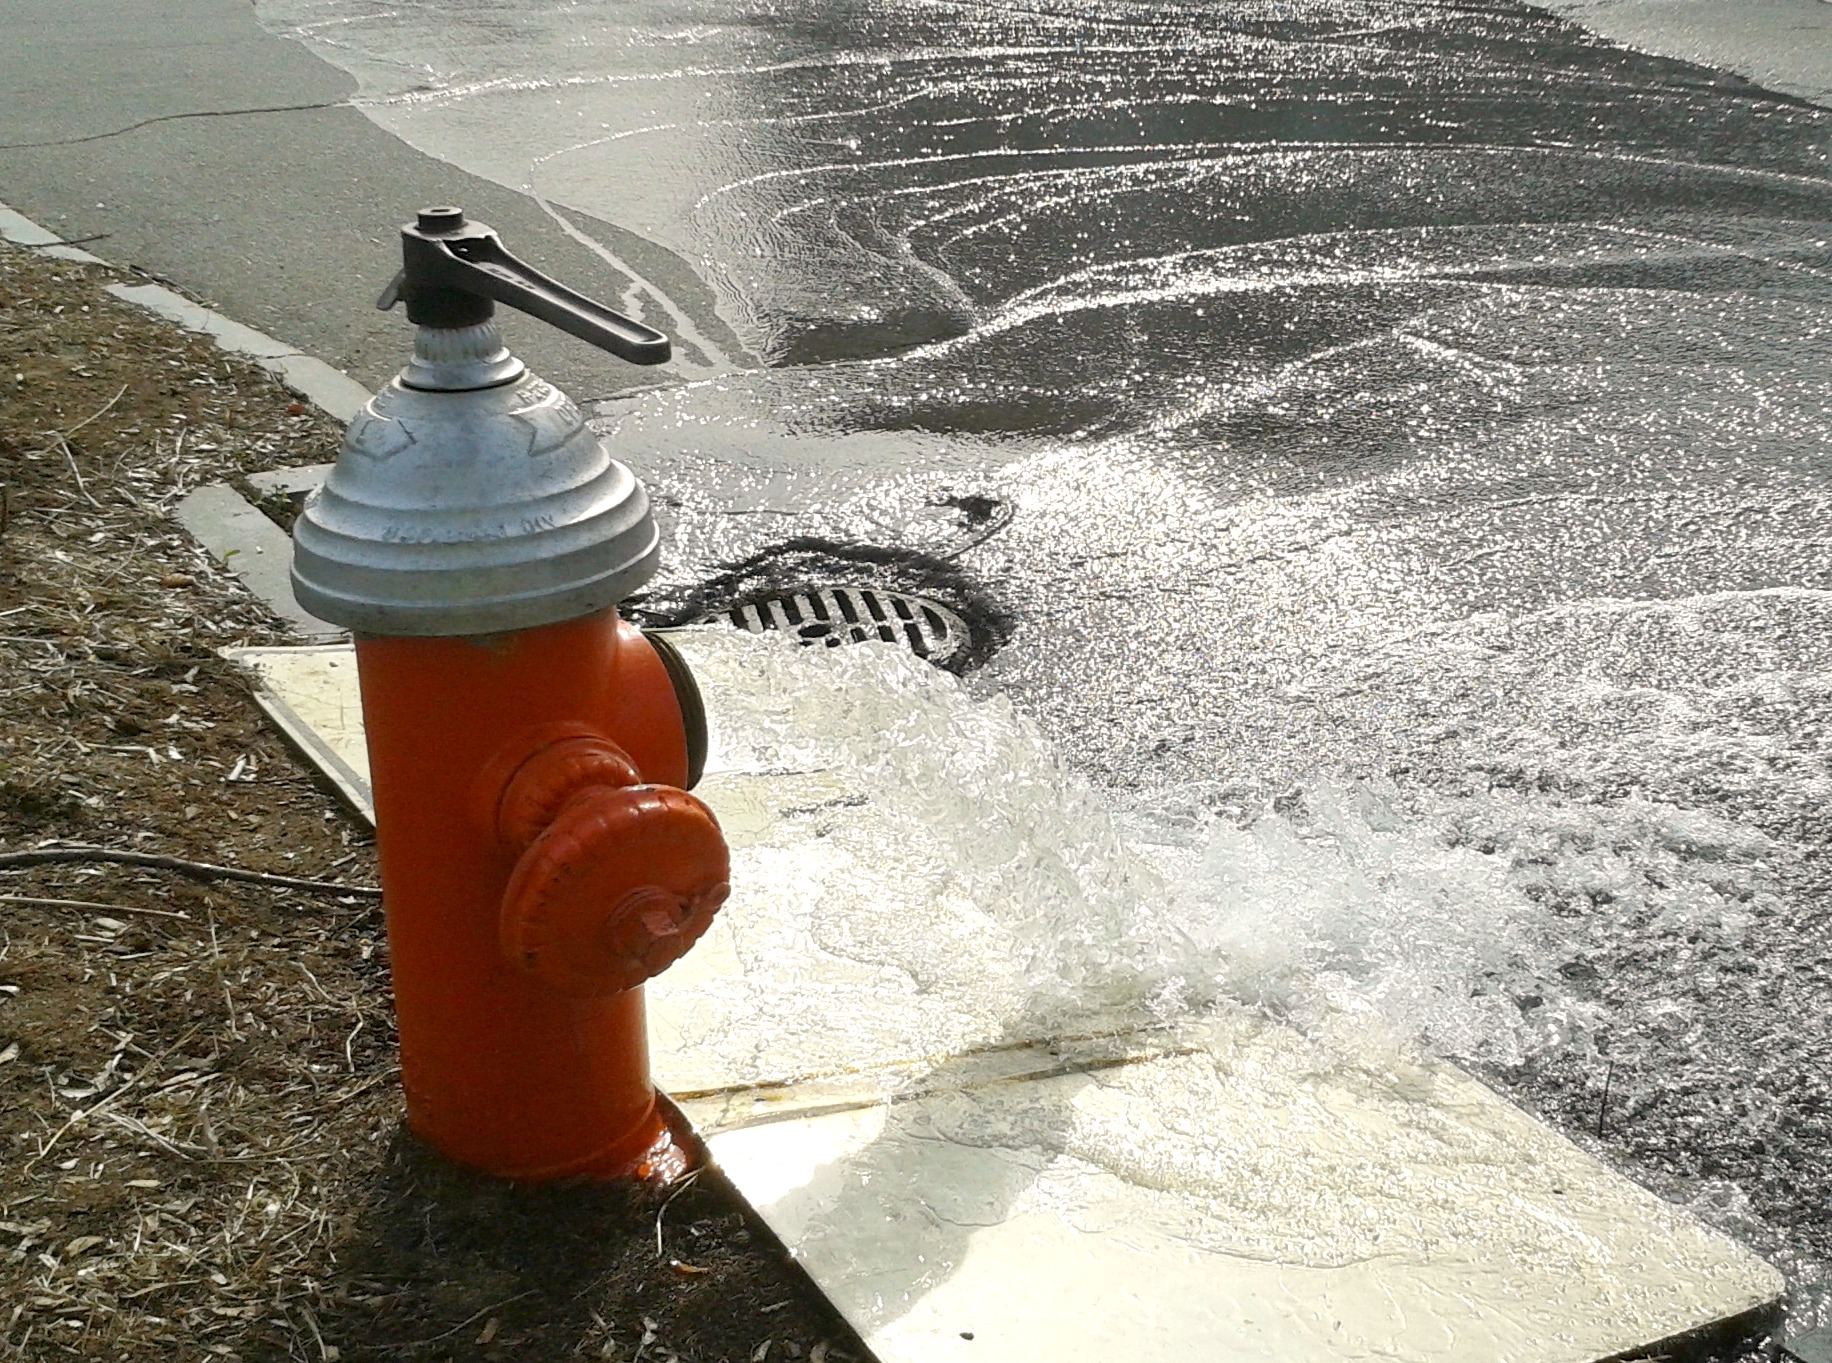 Concord Hydrant Flushing